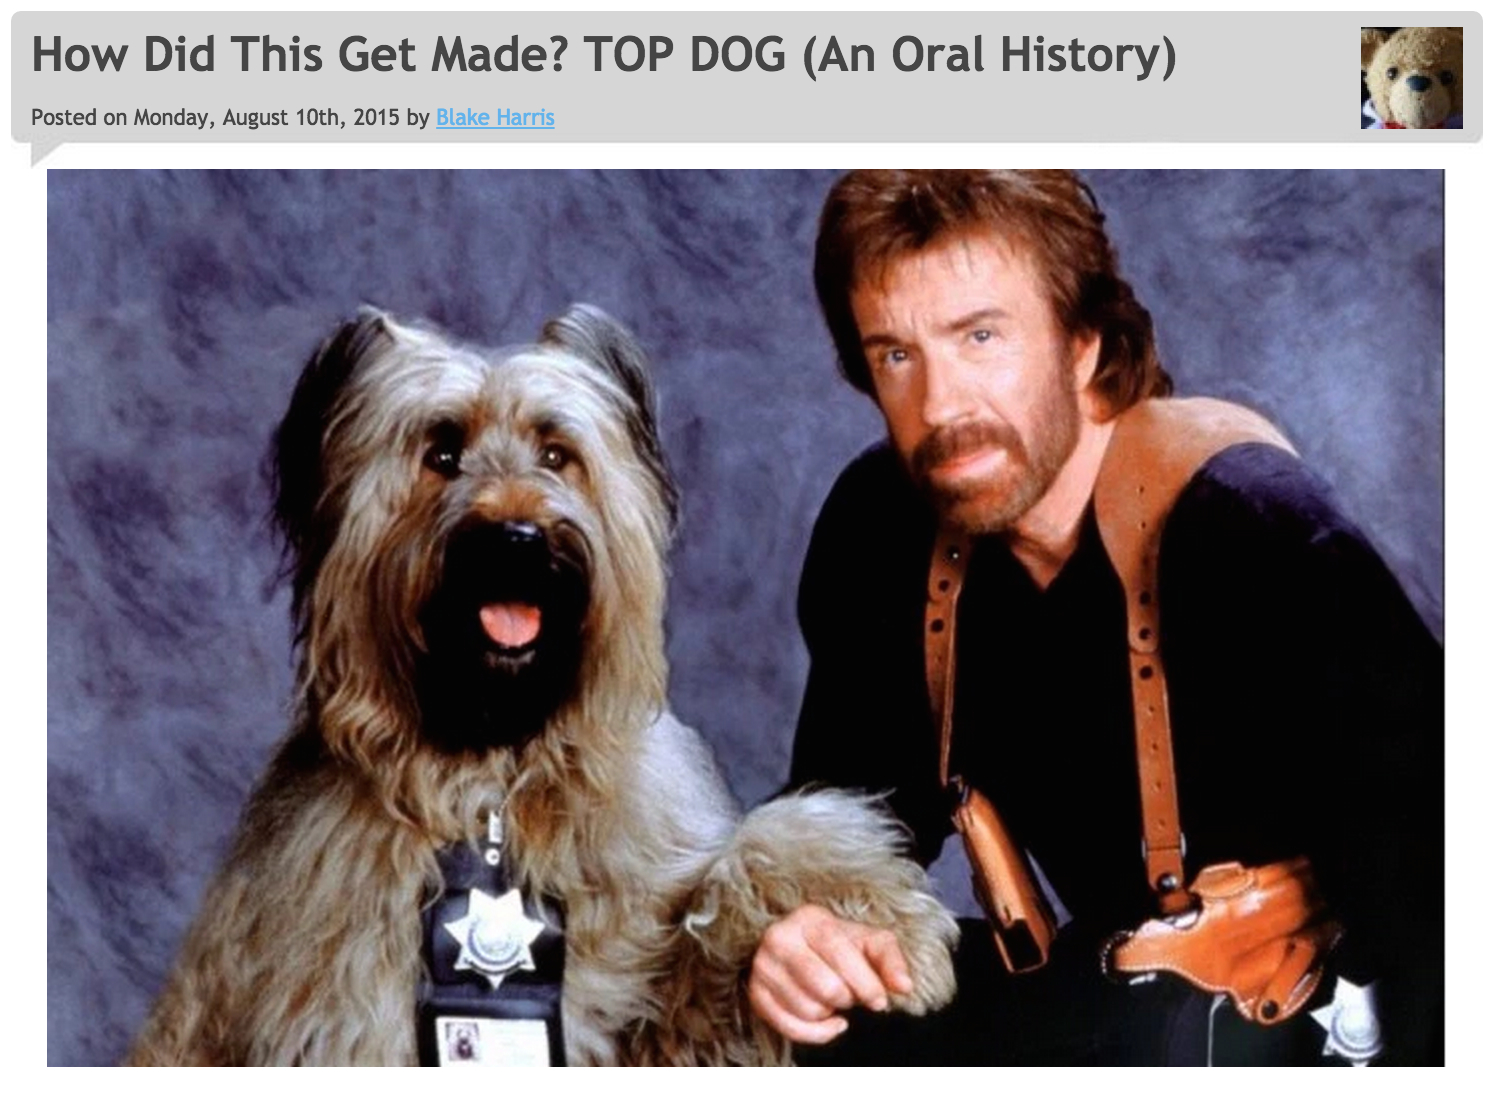 8/10/2015: TOP DOG